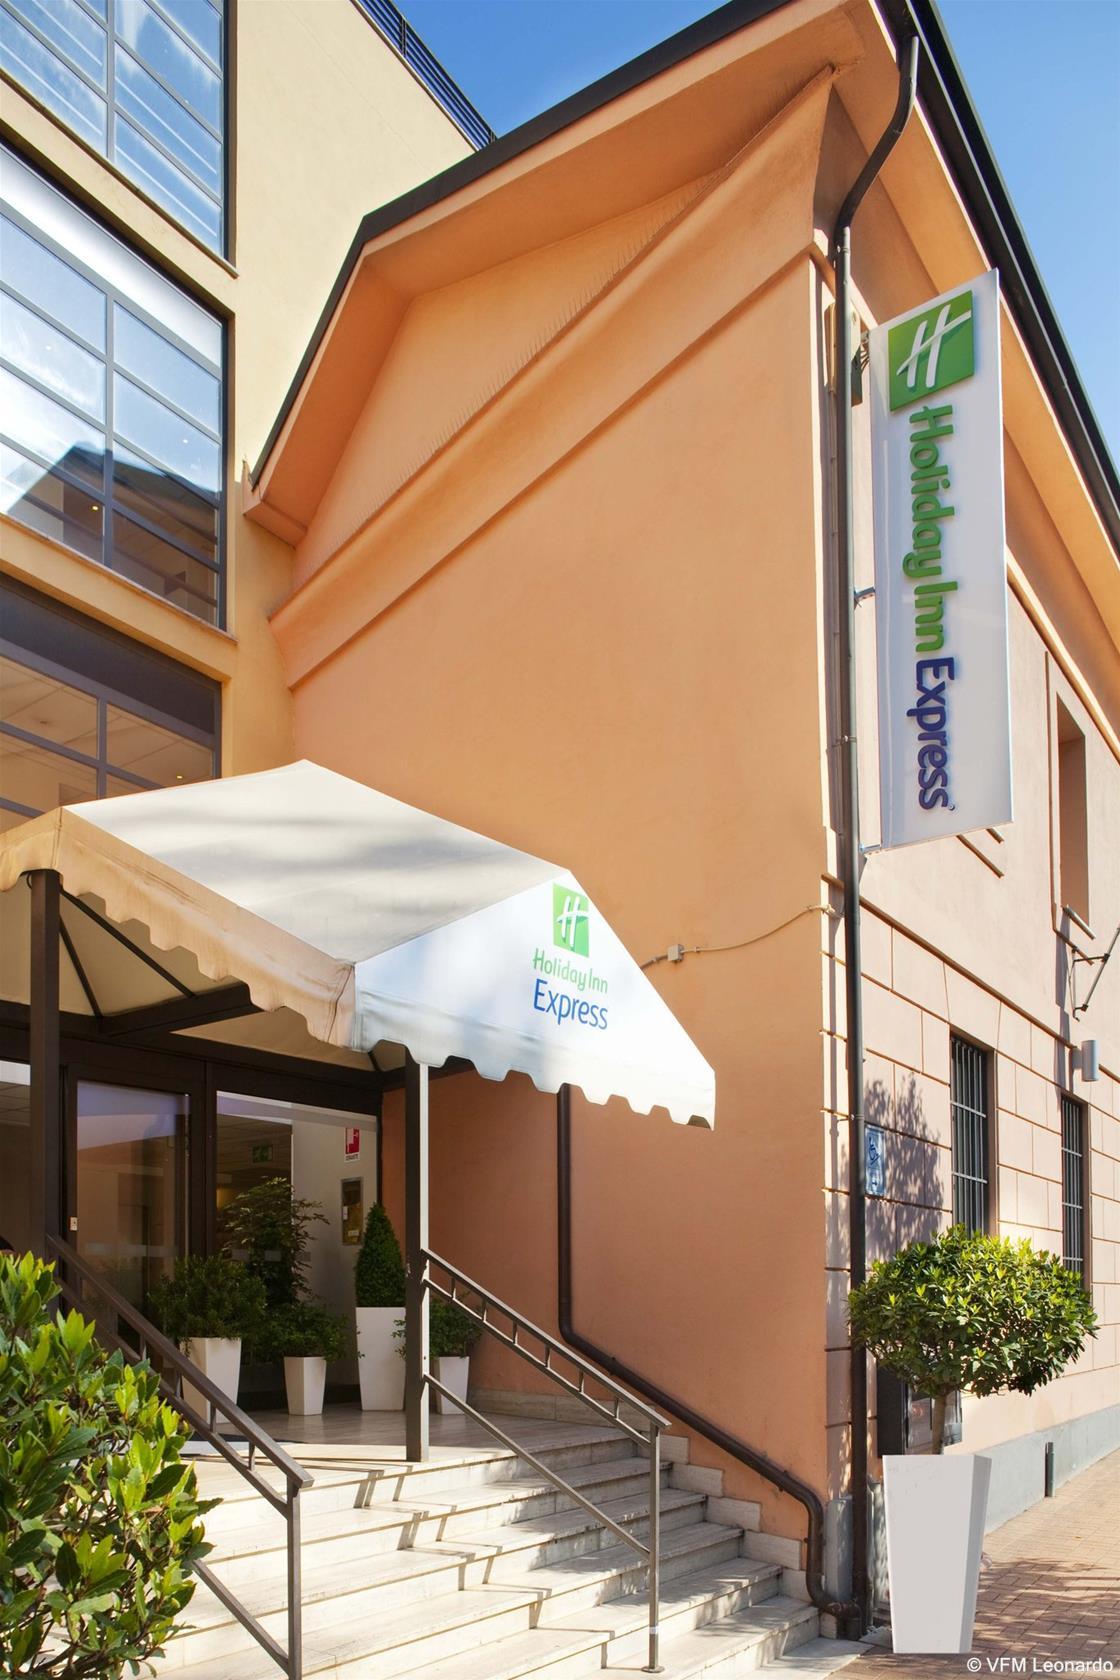 Chollo Viajes 2017 Hoteles en Roma